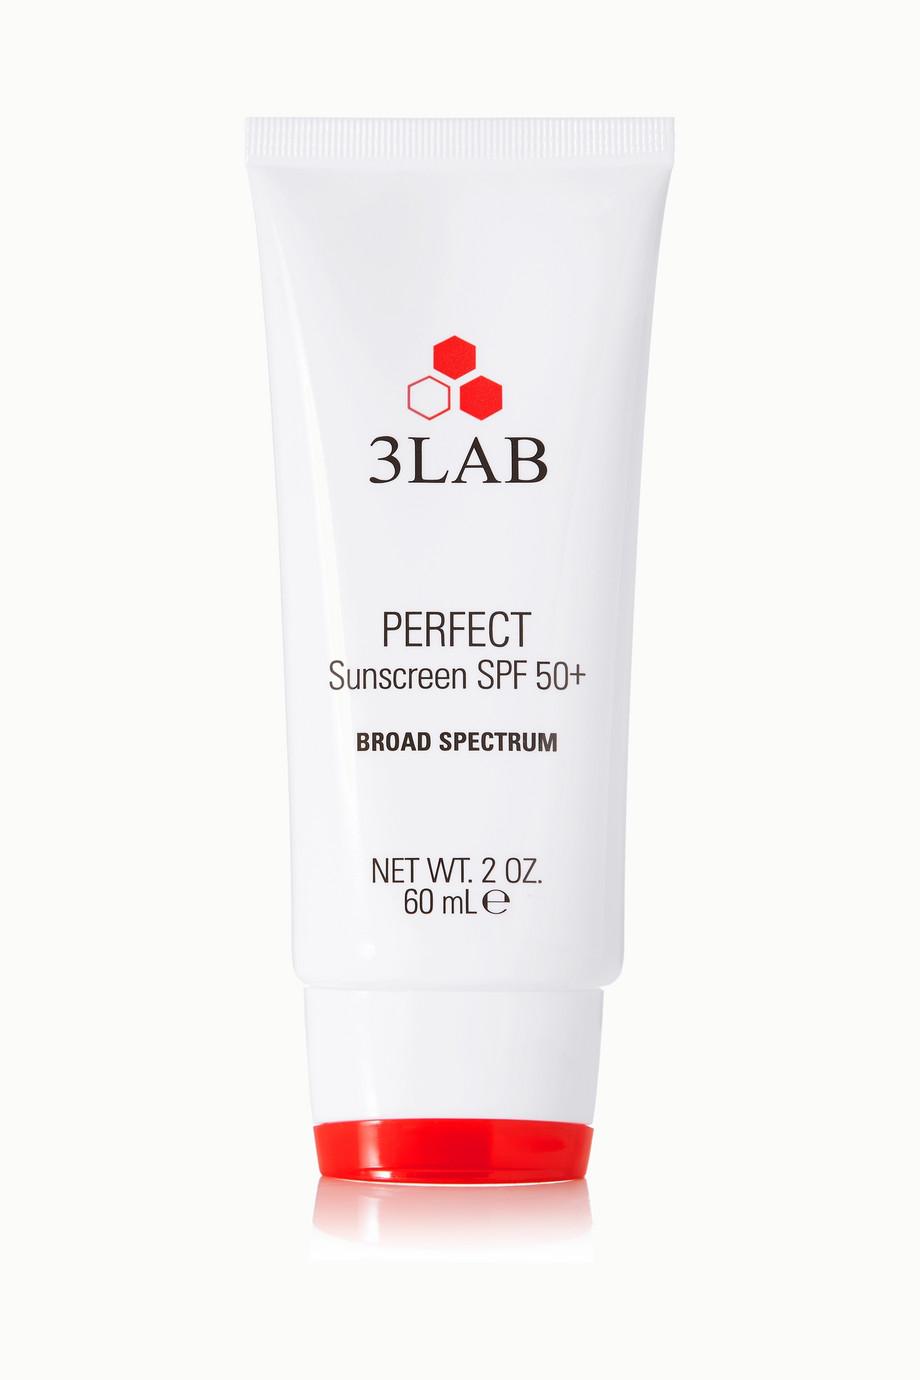 3LAB 完美广谱防晒霜 SPF50,60ml